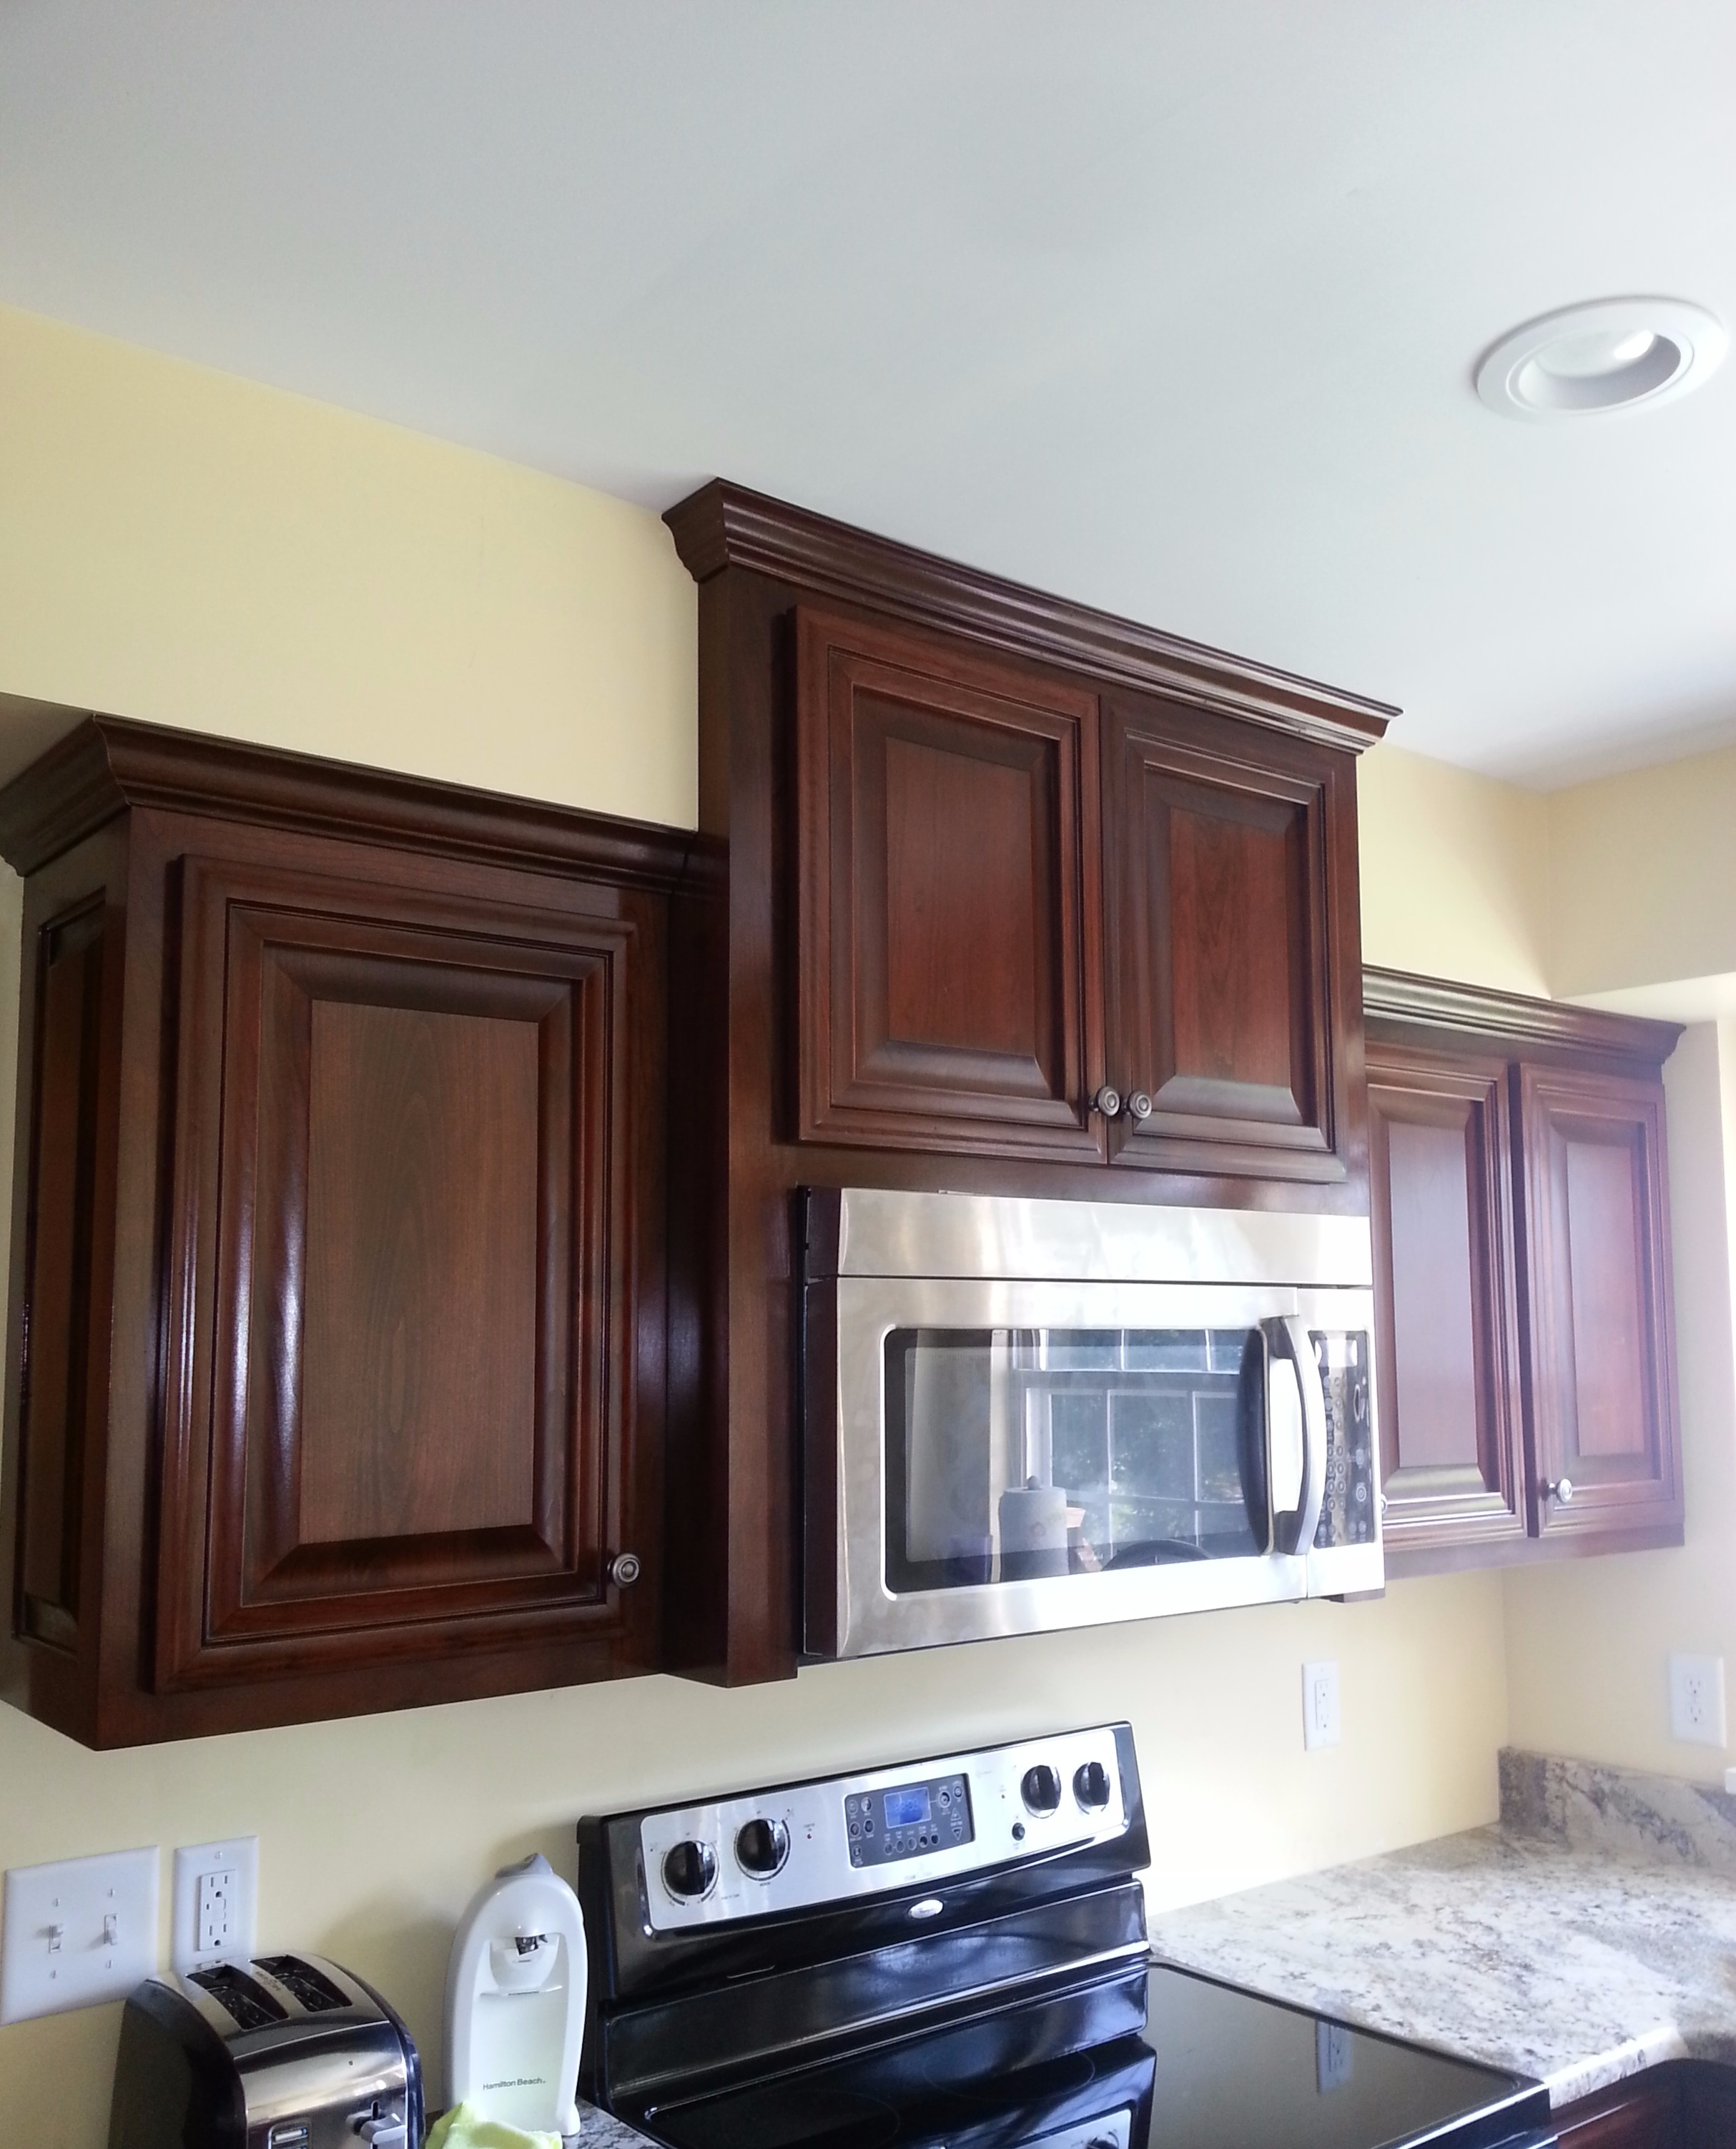 Wrap Around Kitchen Cabinets Gallery Ashland Va Pm Cabinets Inc